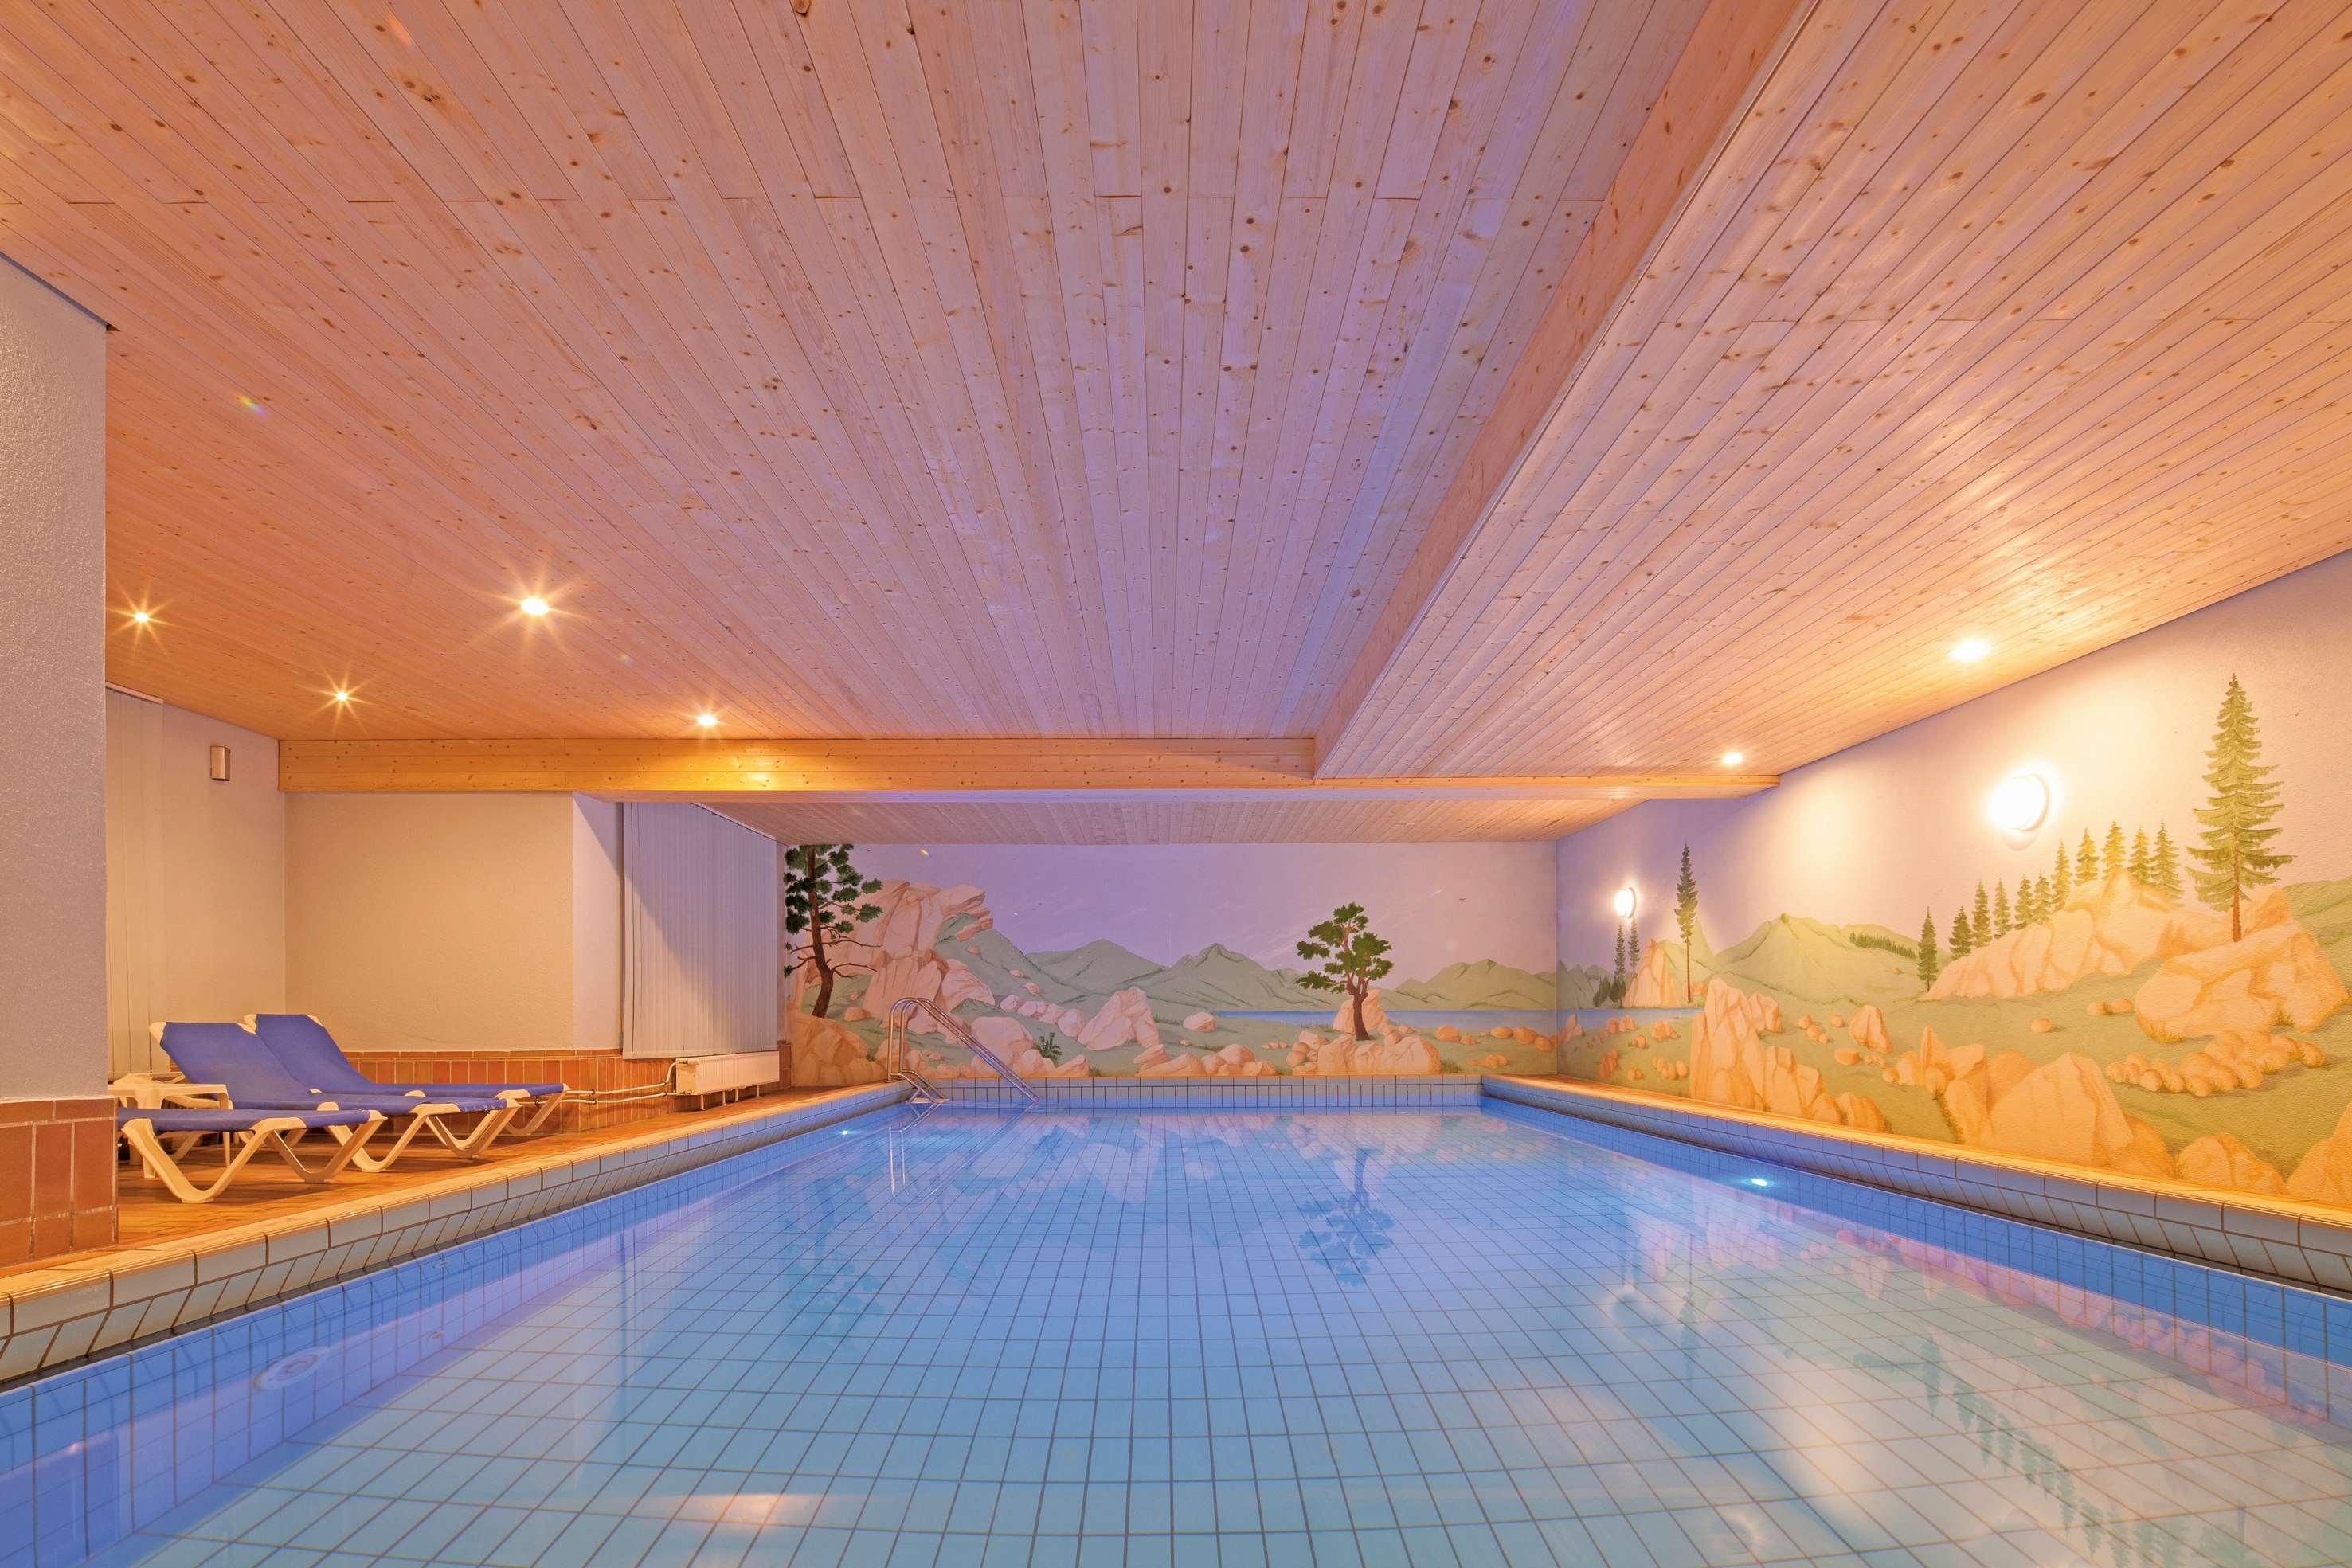 Best western plus hotel schwarzwald residenz triberg for Design hotel schwarzwald